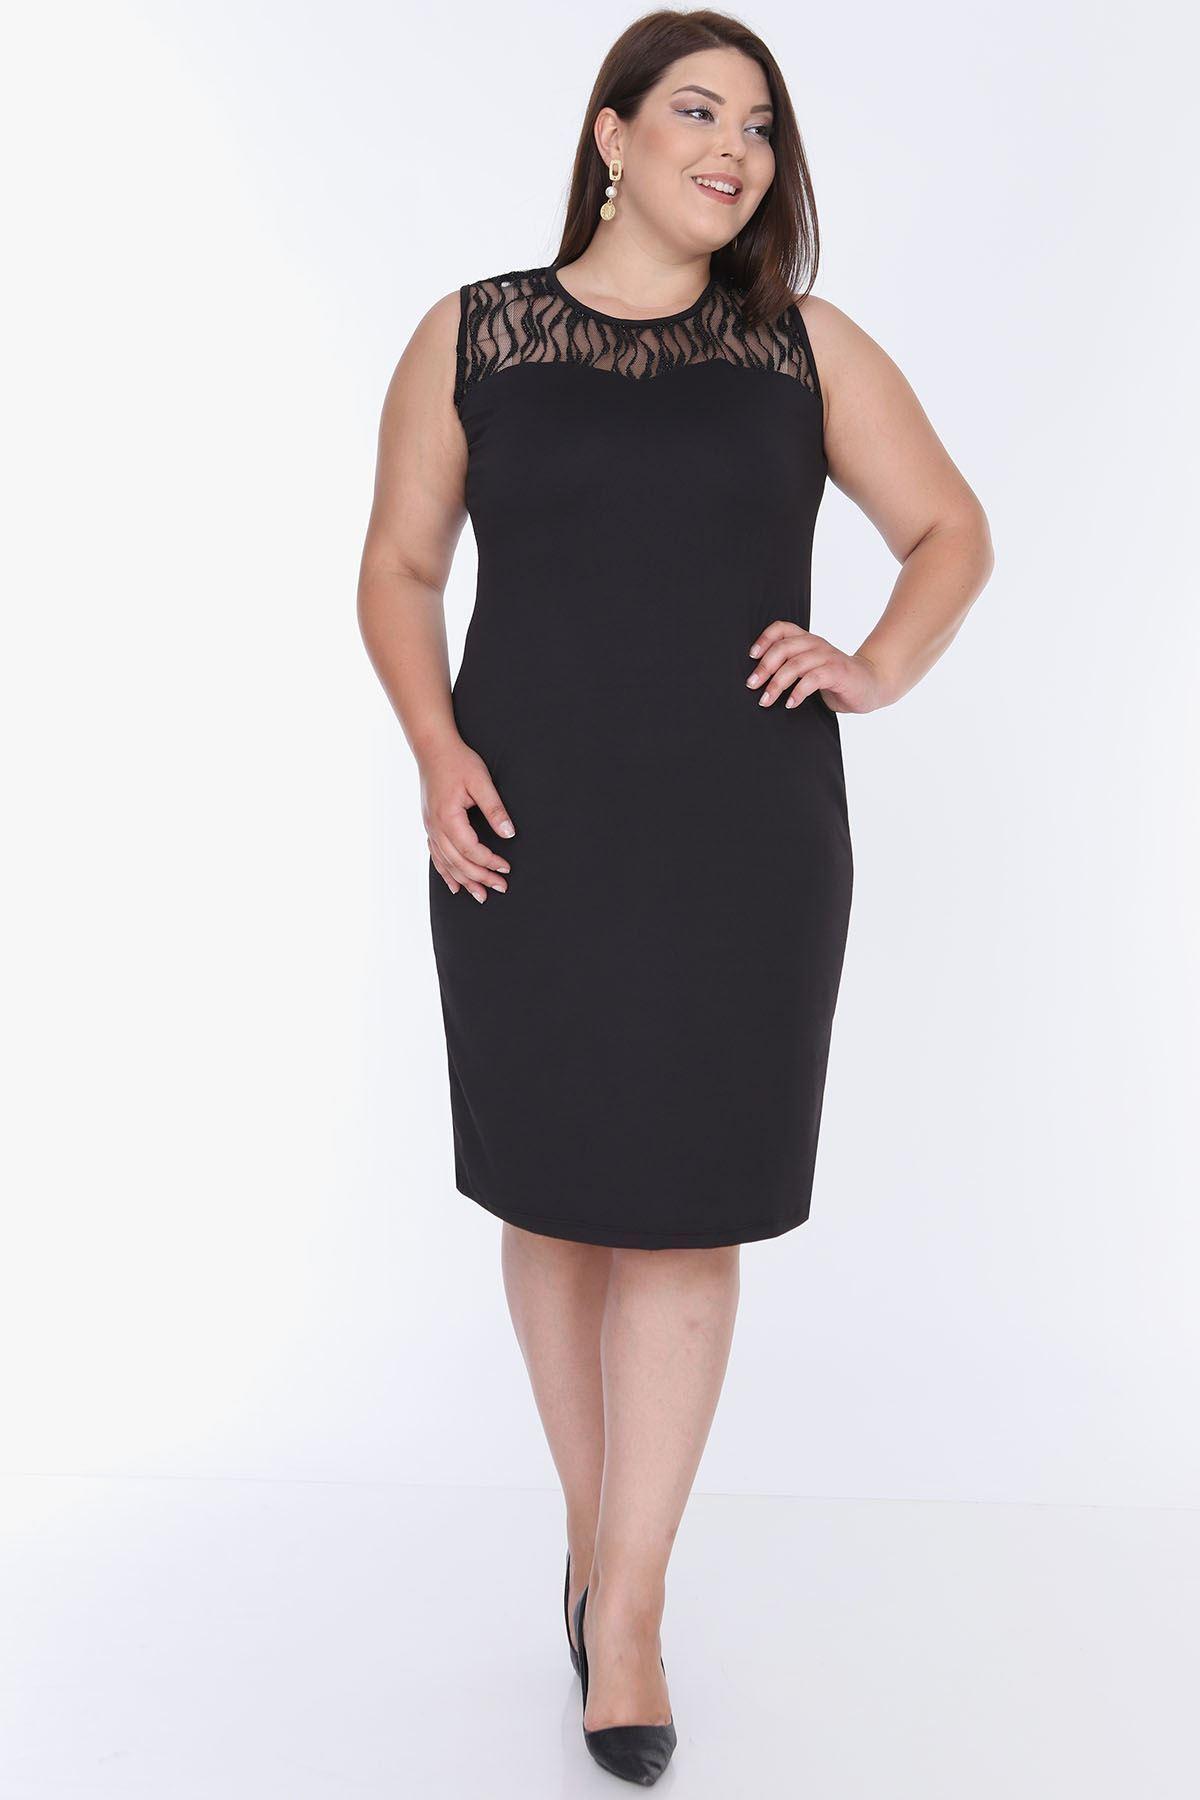 Simli Dantelli Elbise 2E-0660